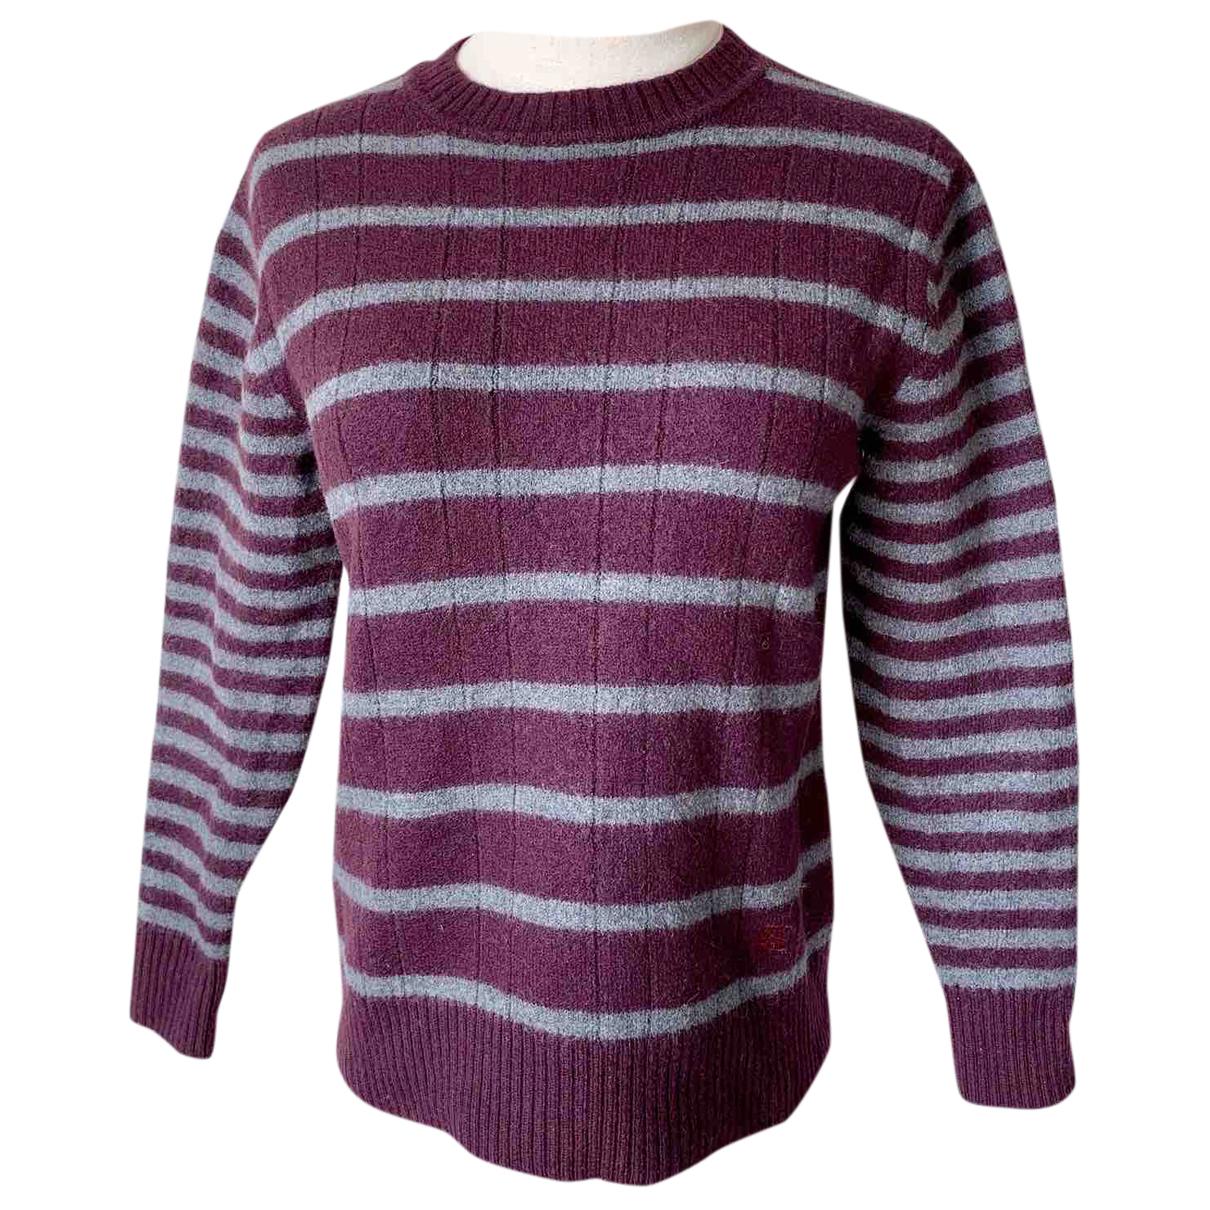 Burberry N Burgundy Wool Knitwear for Women S International